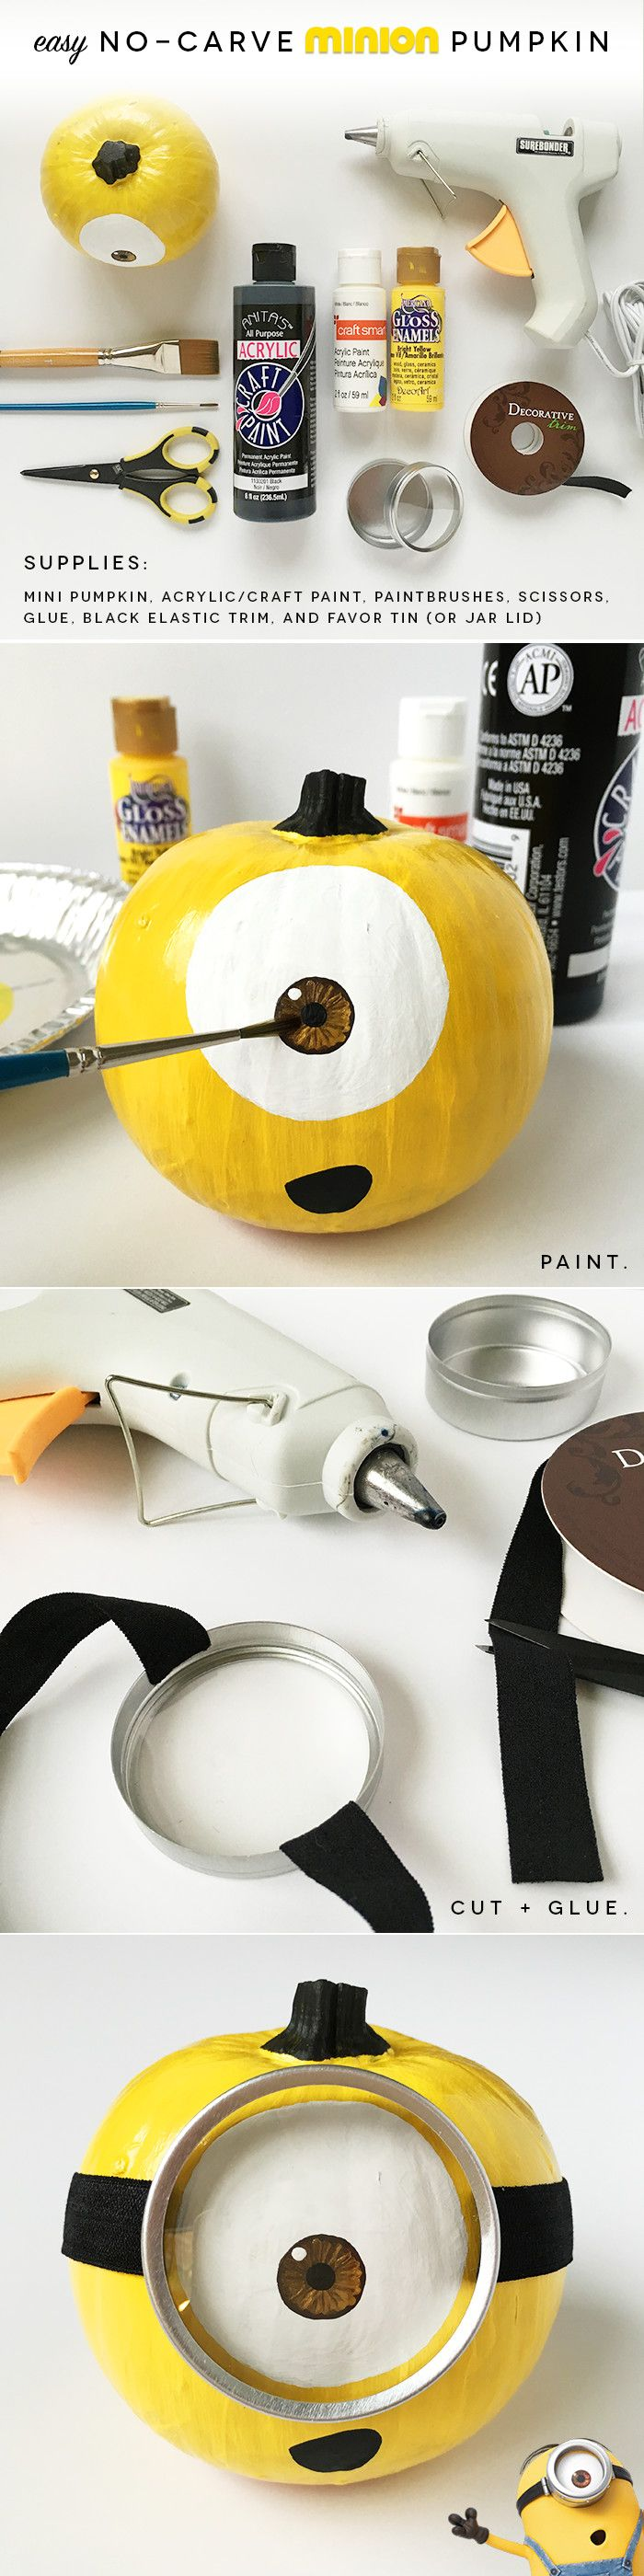 The 25+ best Minion pumpkin ideas on Pinterest | Minion pumpkin ...